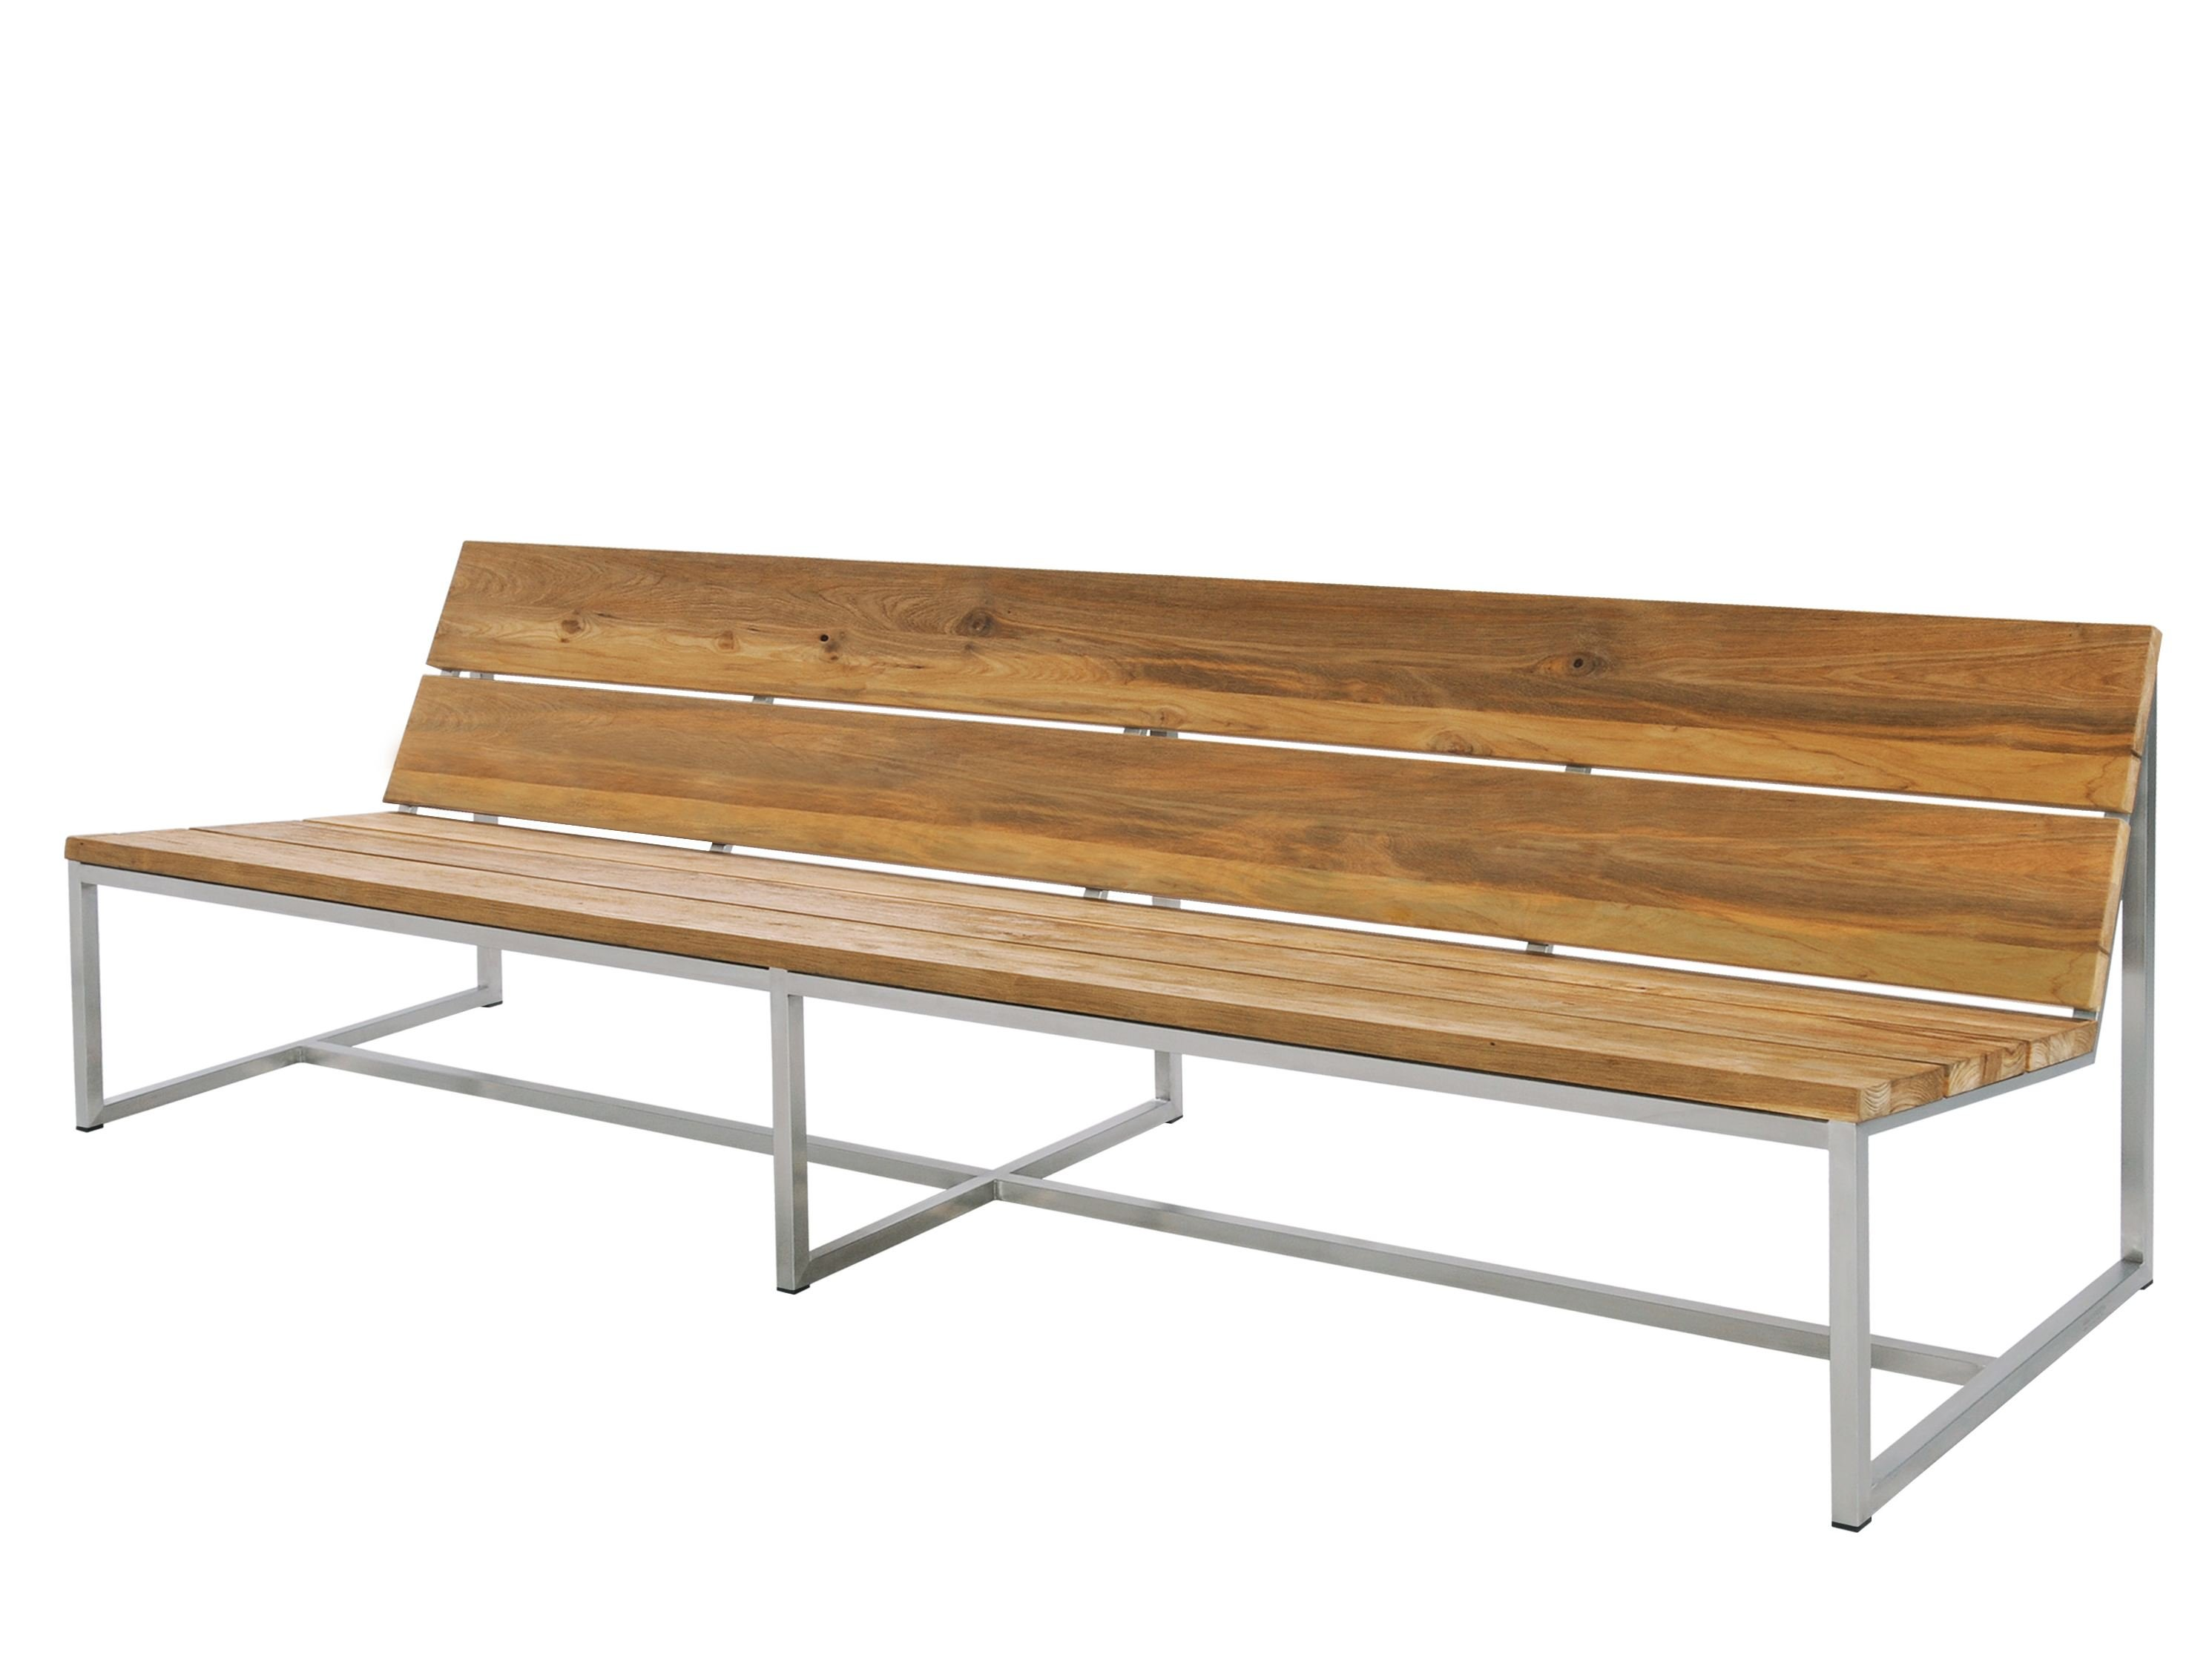 Panca da giardino in acciaio inox e legno con schienale - Ikea panche esterno ...